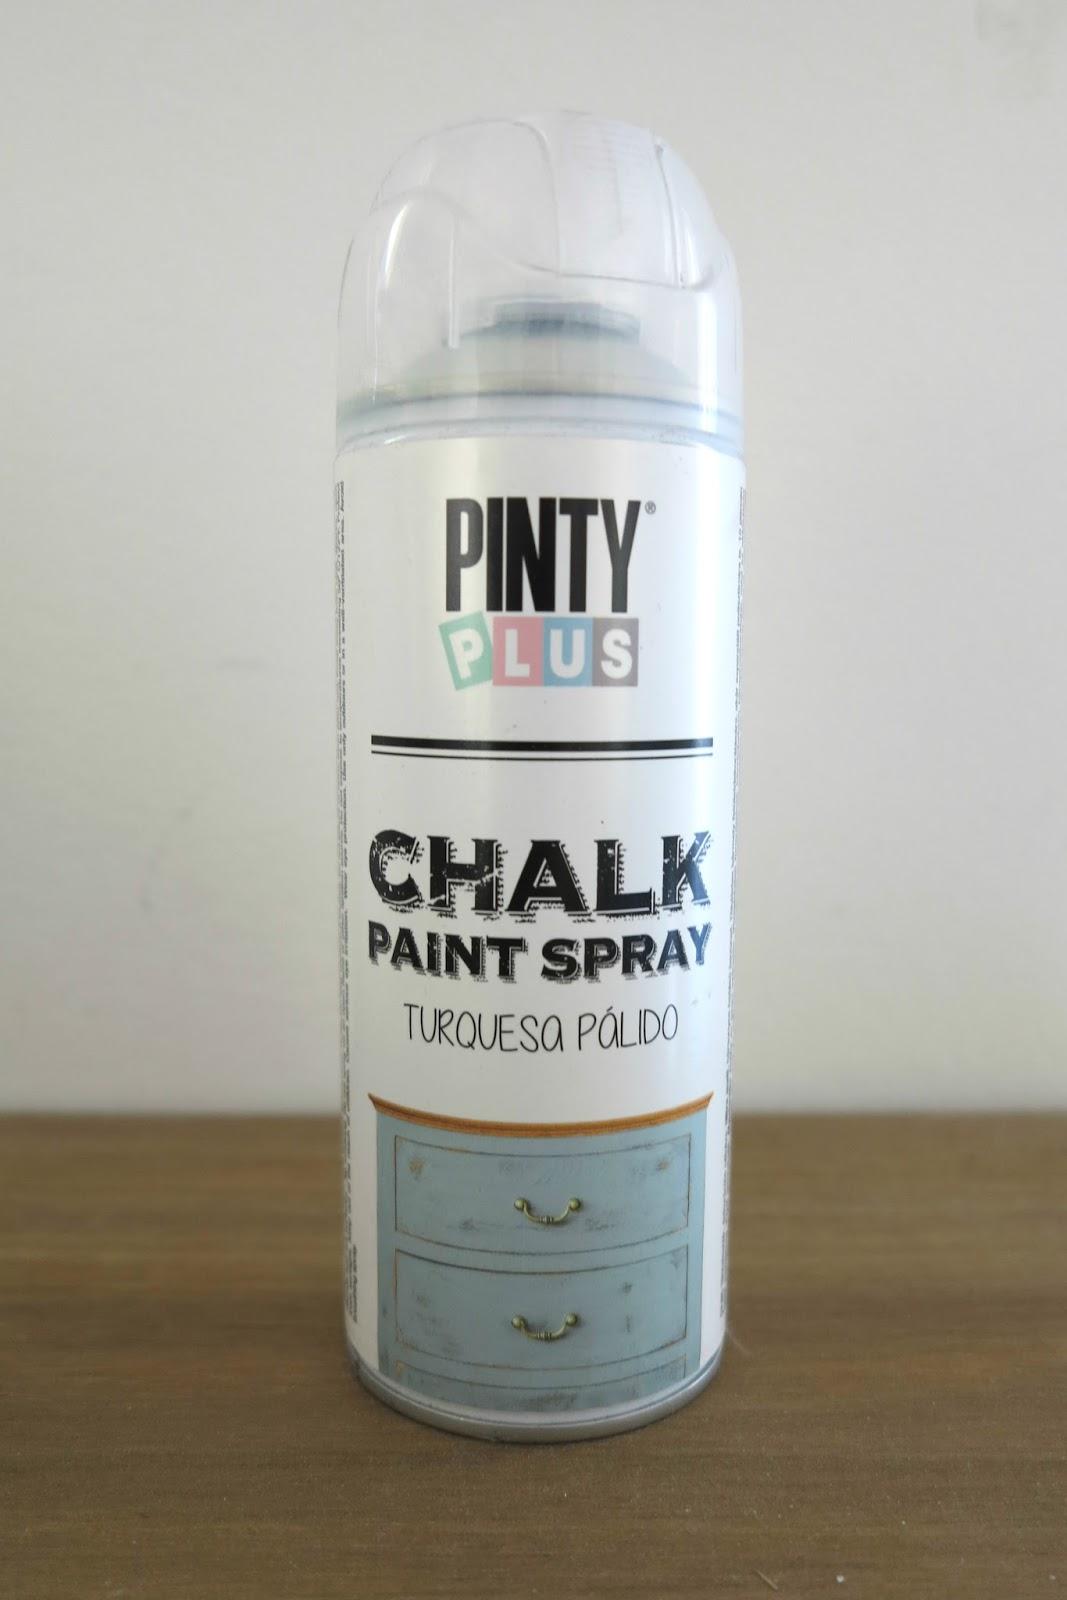 Rocco En Mi Sofa Guia De Pinturas Chalk Paint ~ Leroy Merlin Catã¡logo Pinturas